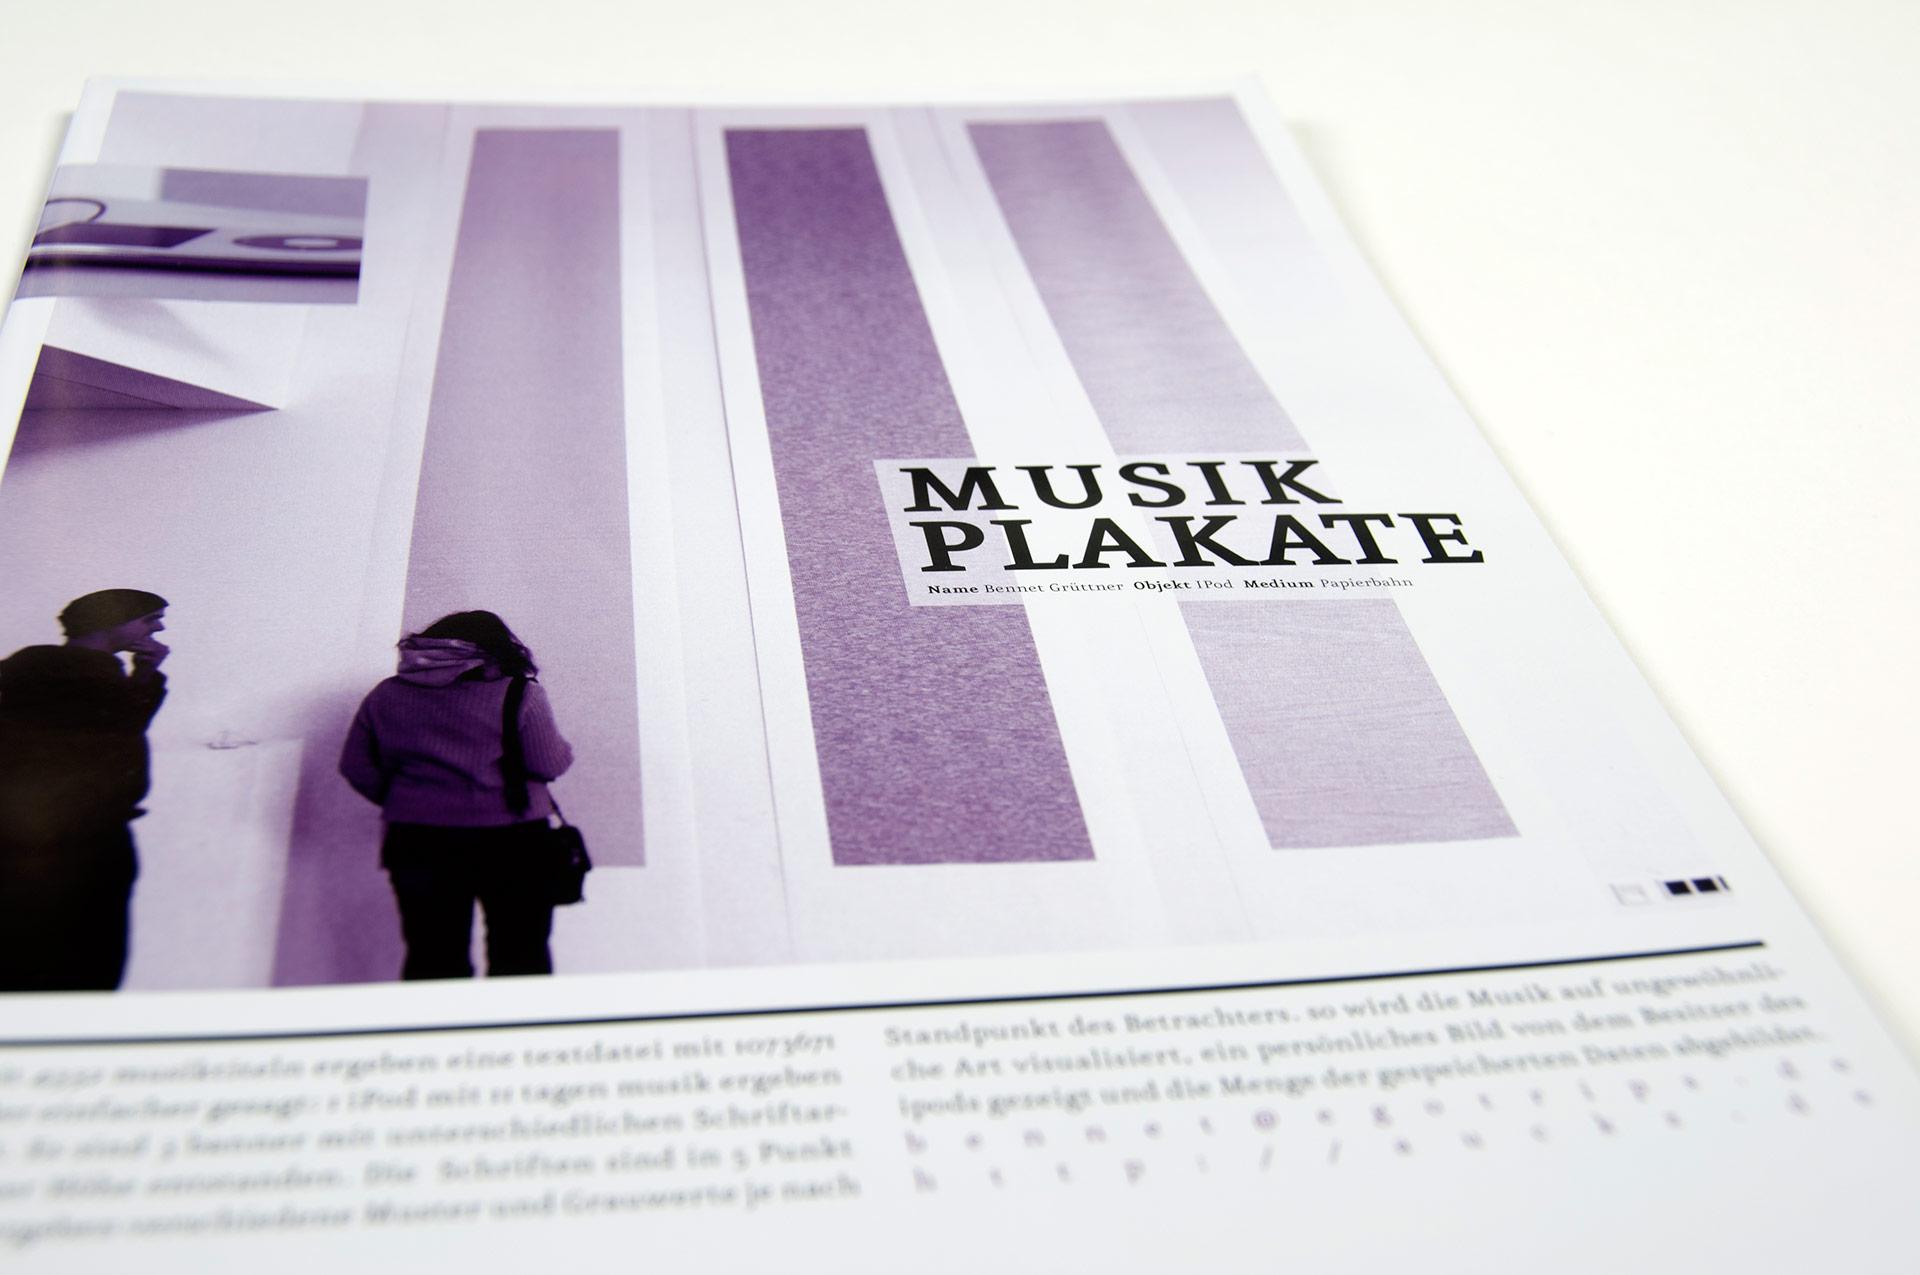 Objekt, Doku, Design, Projekt, Fh, Münster, Grafik, Plakate, Heft, Magazin, Bennet Grüttner